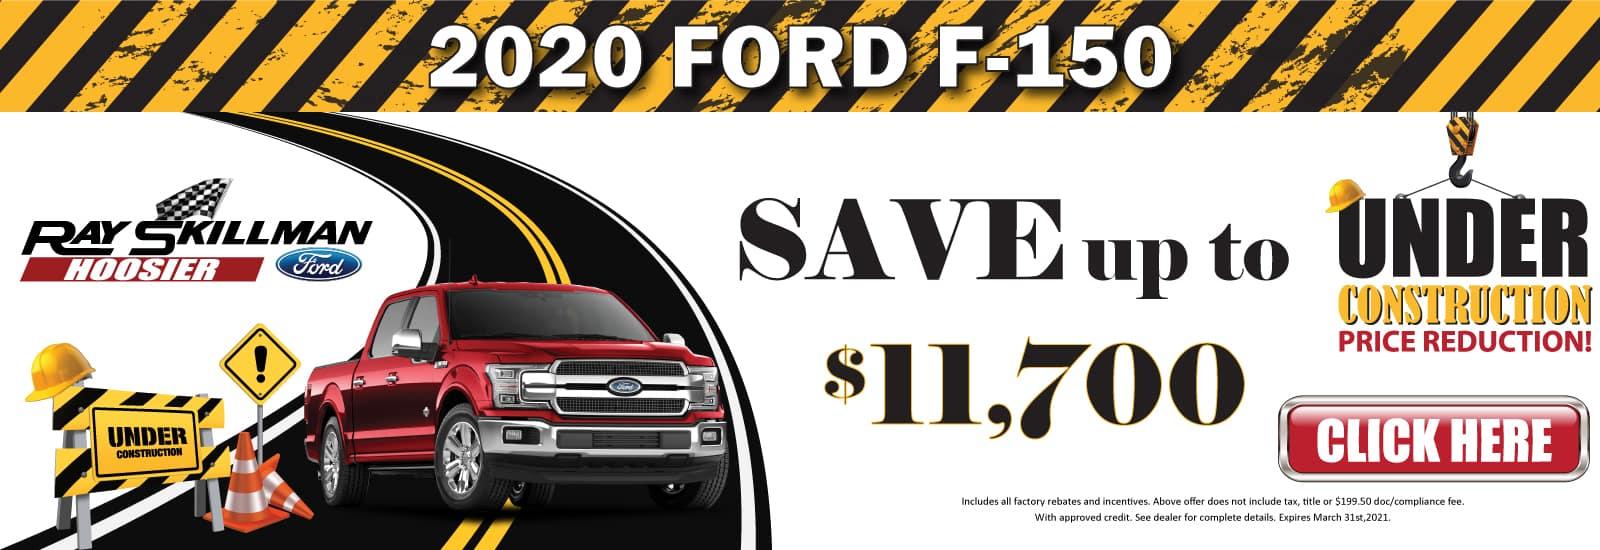 hoosier2020-Ford-F-150-Web-Banner-1600×550